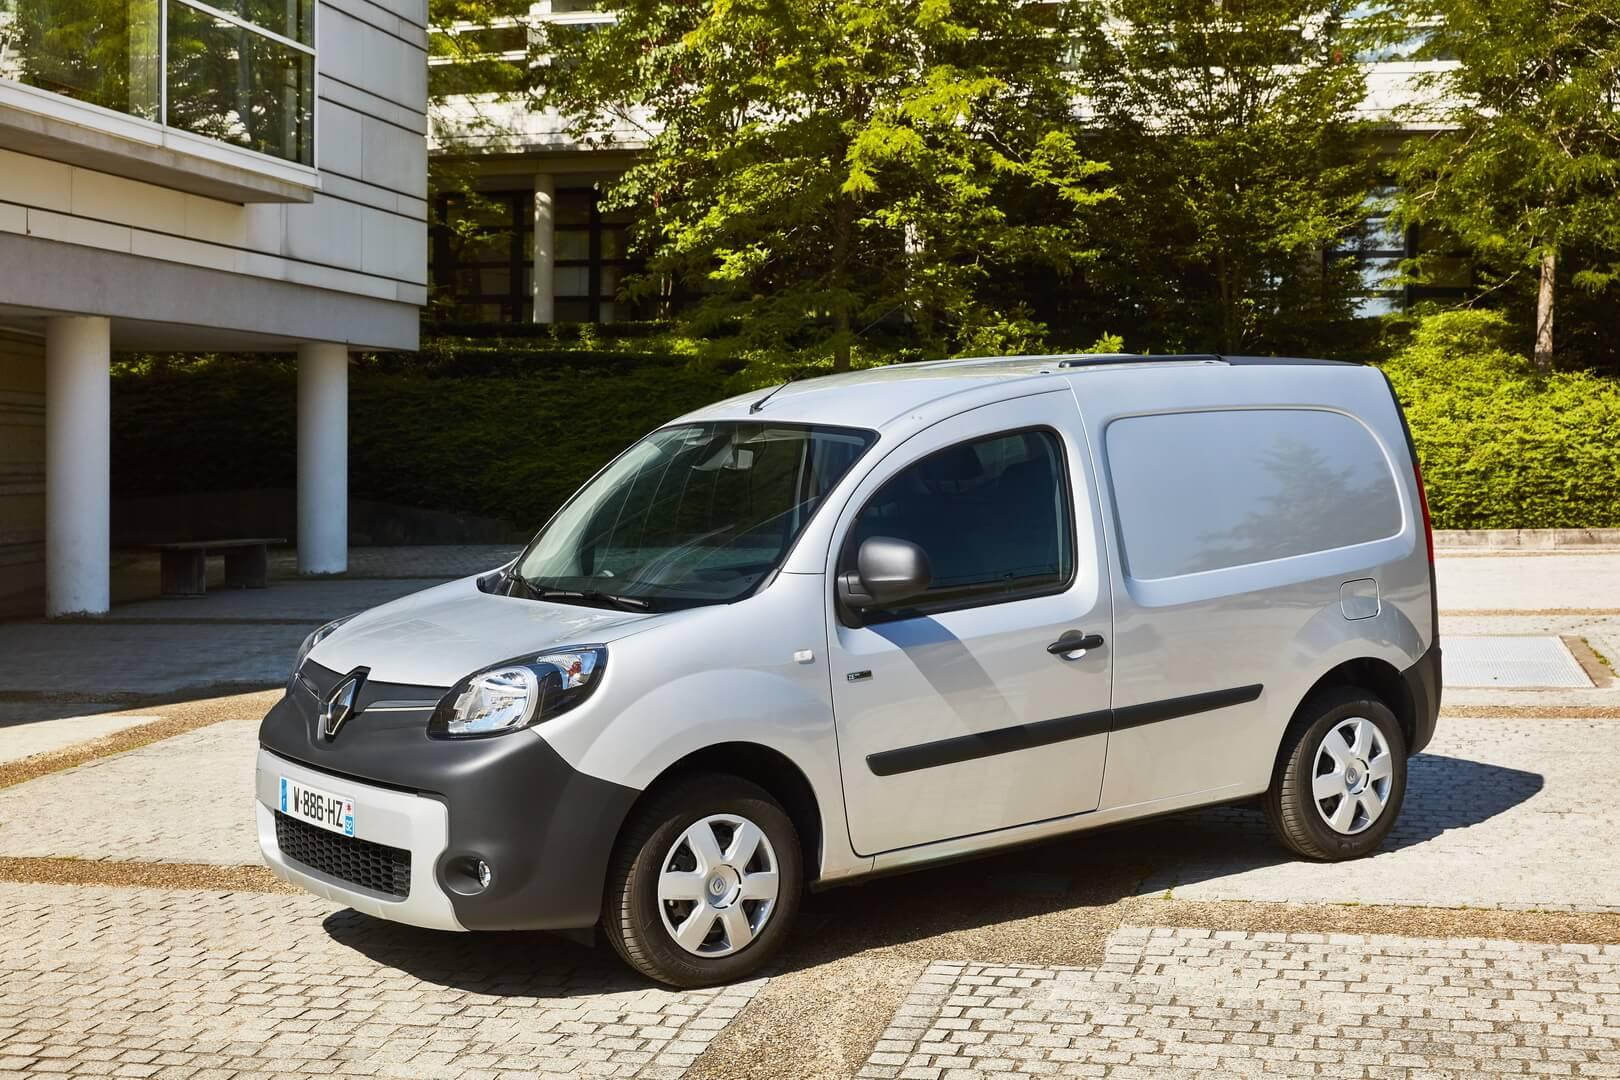 Фургон Renault Kangoo Z.E. — лидер коммерческих электромобилей